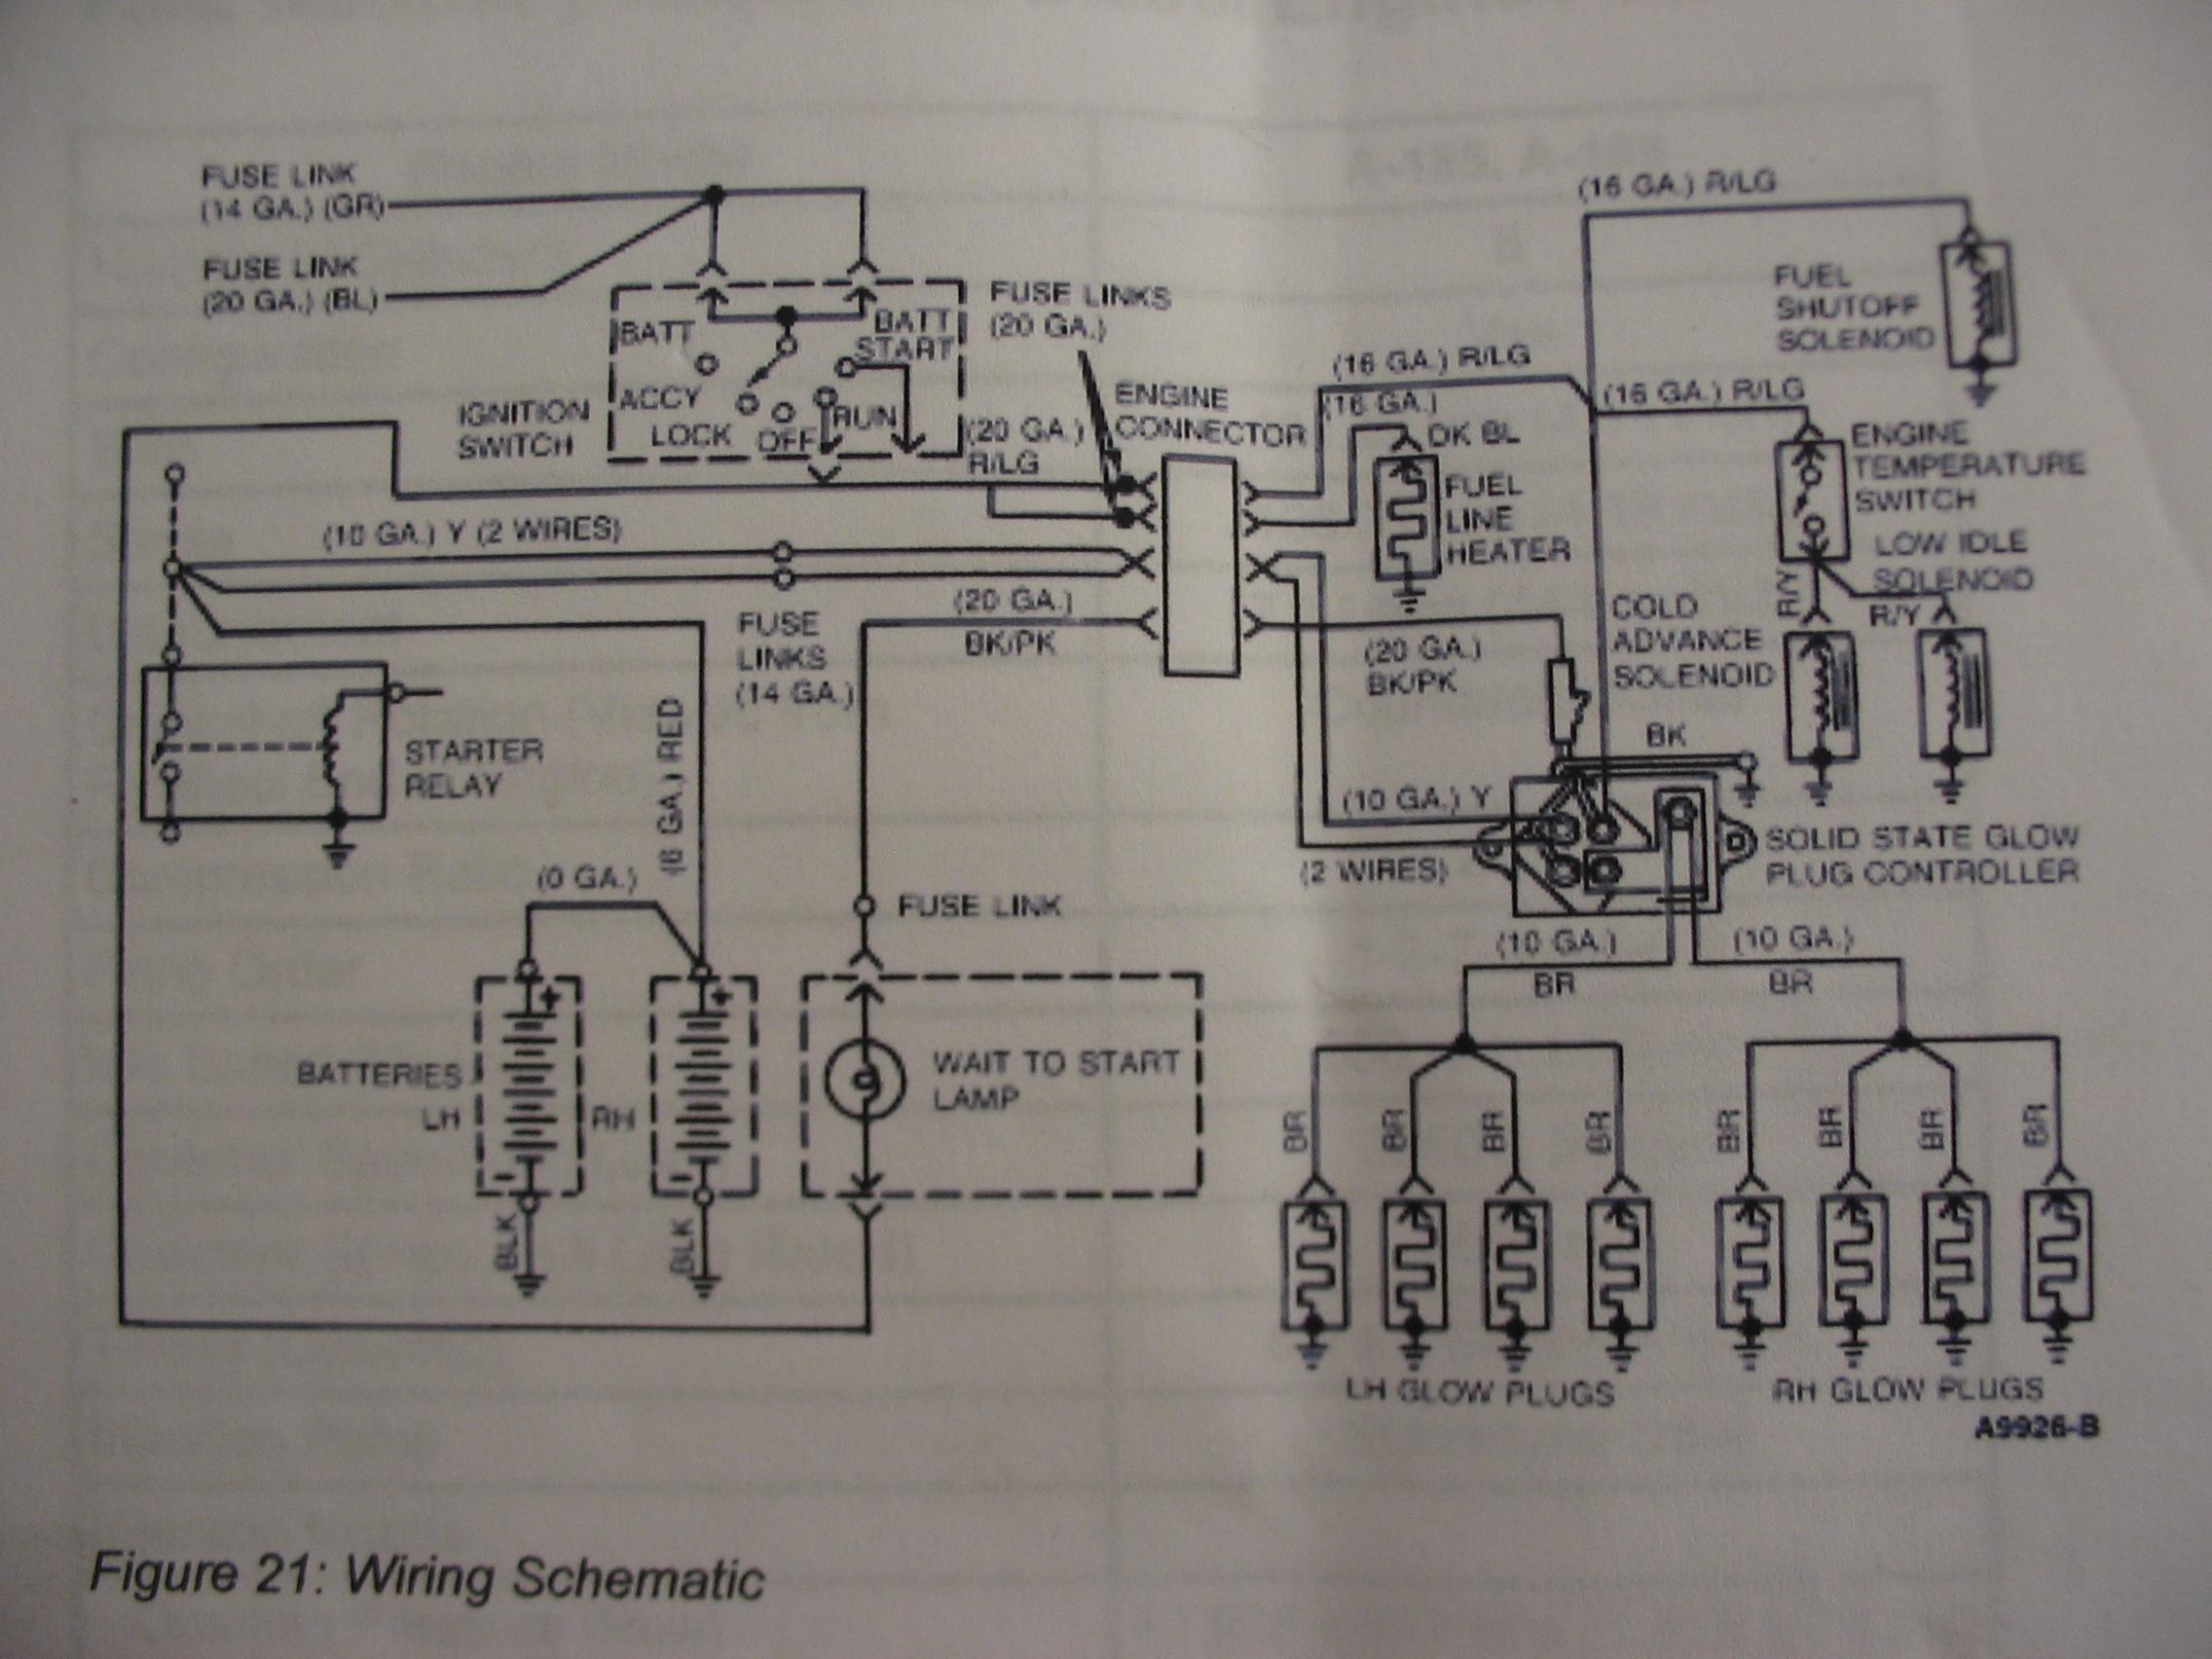 glow plug wiring diagram sea turtle life cycle ford diagrams